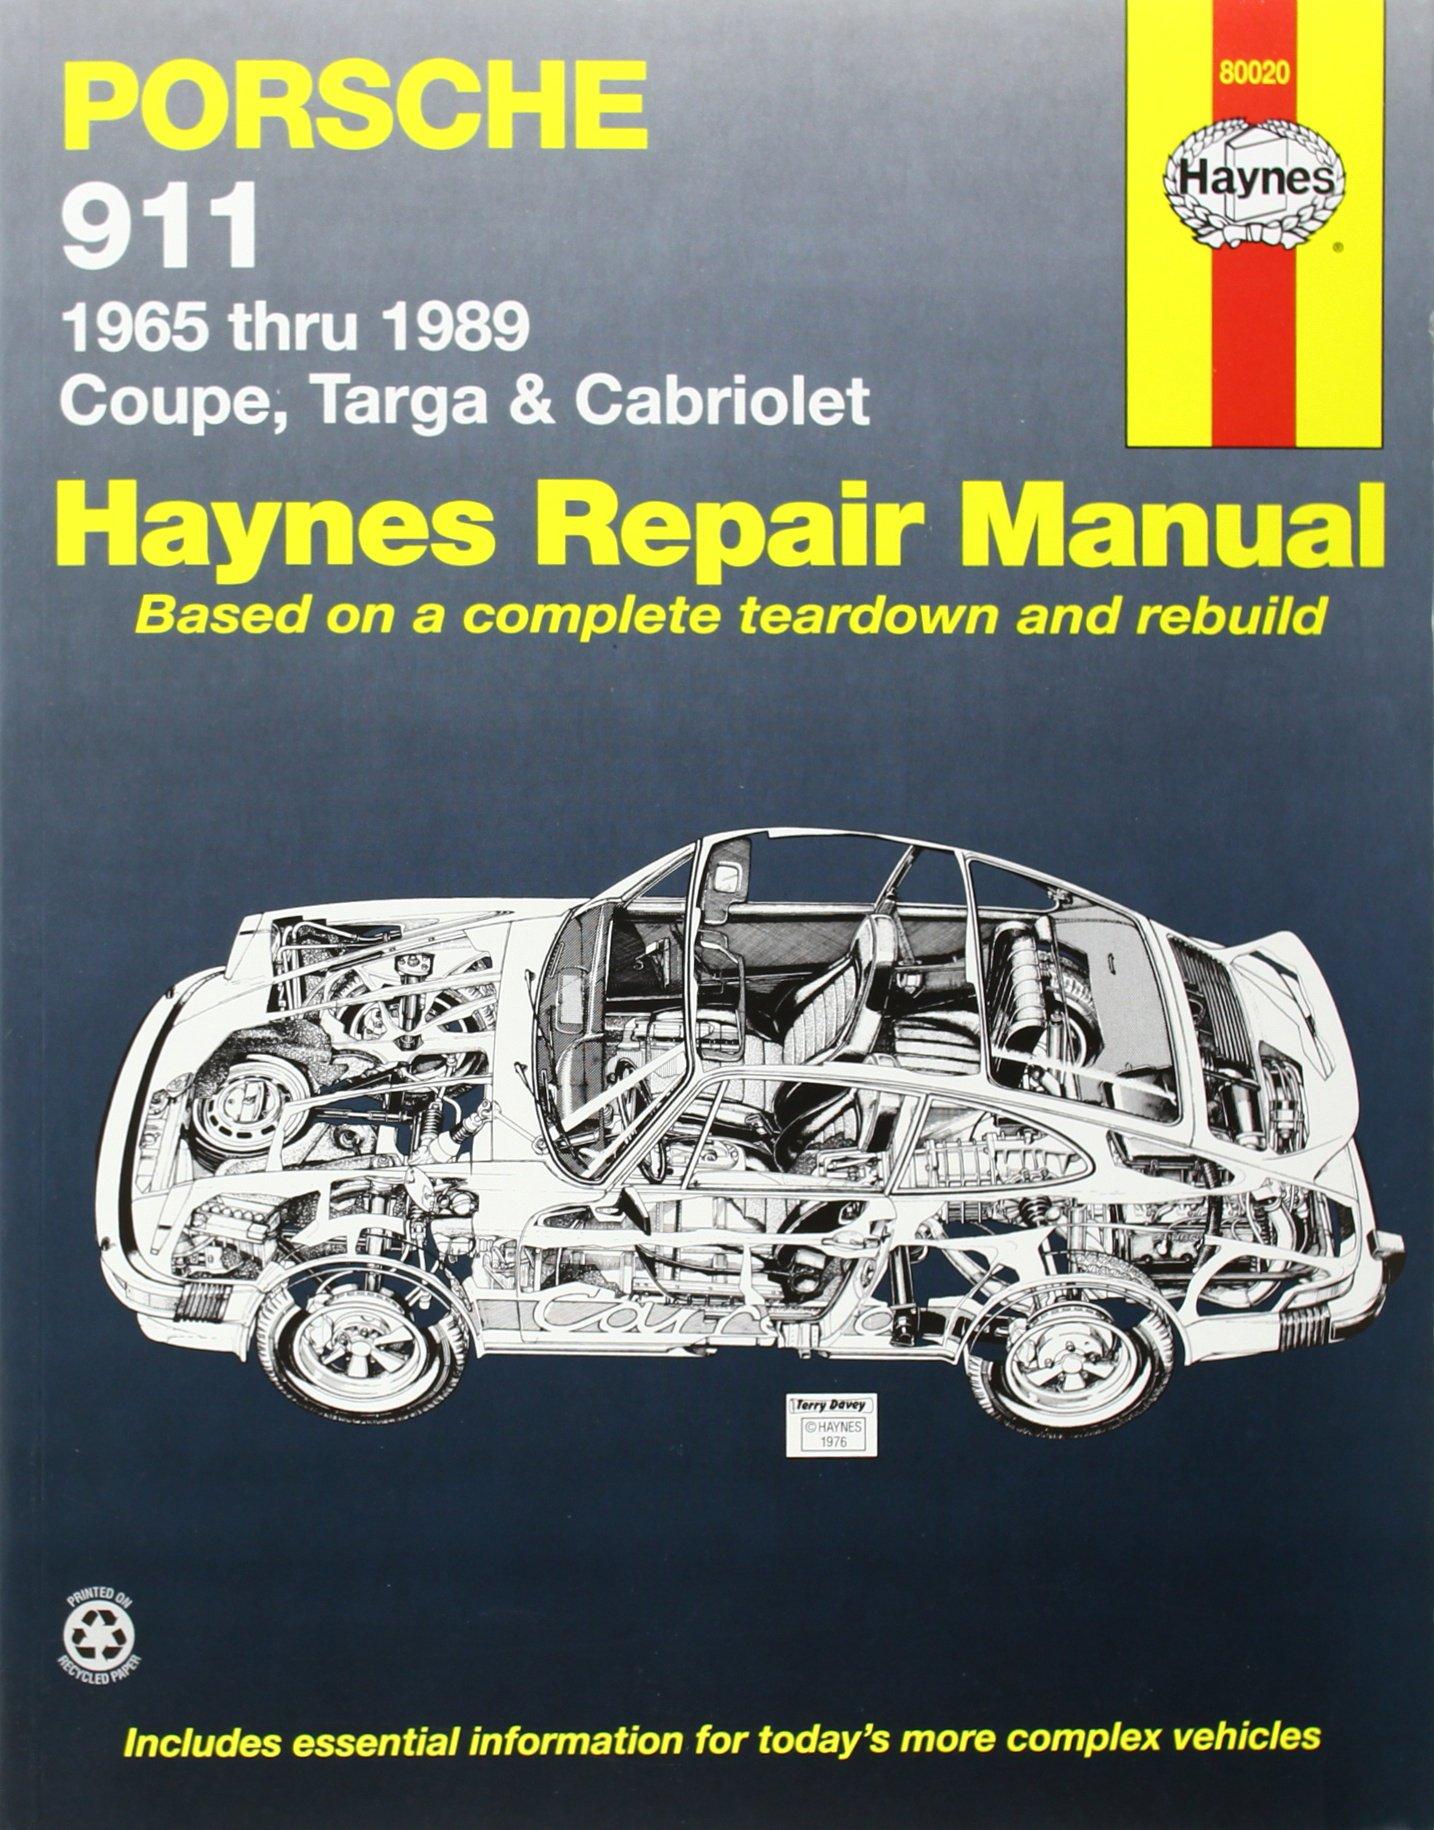 Porsche 911 automotive repair manual 1965 to 1989 coupe targa porsche 911 automotive repair manual 1965 to 1989 coupe targa cabriolet haynes 0038345002649 amazon books fandeluxe Gallery